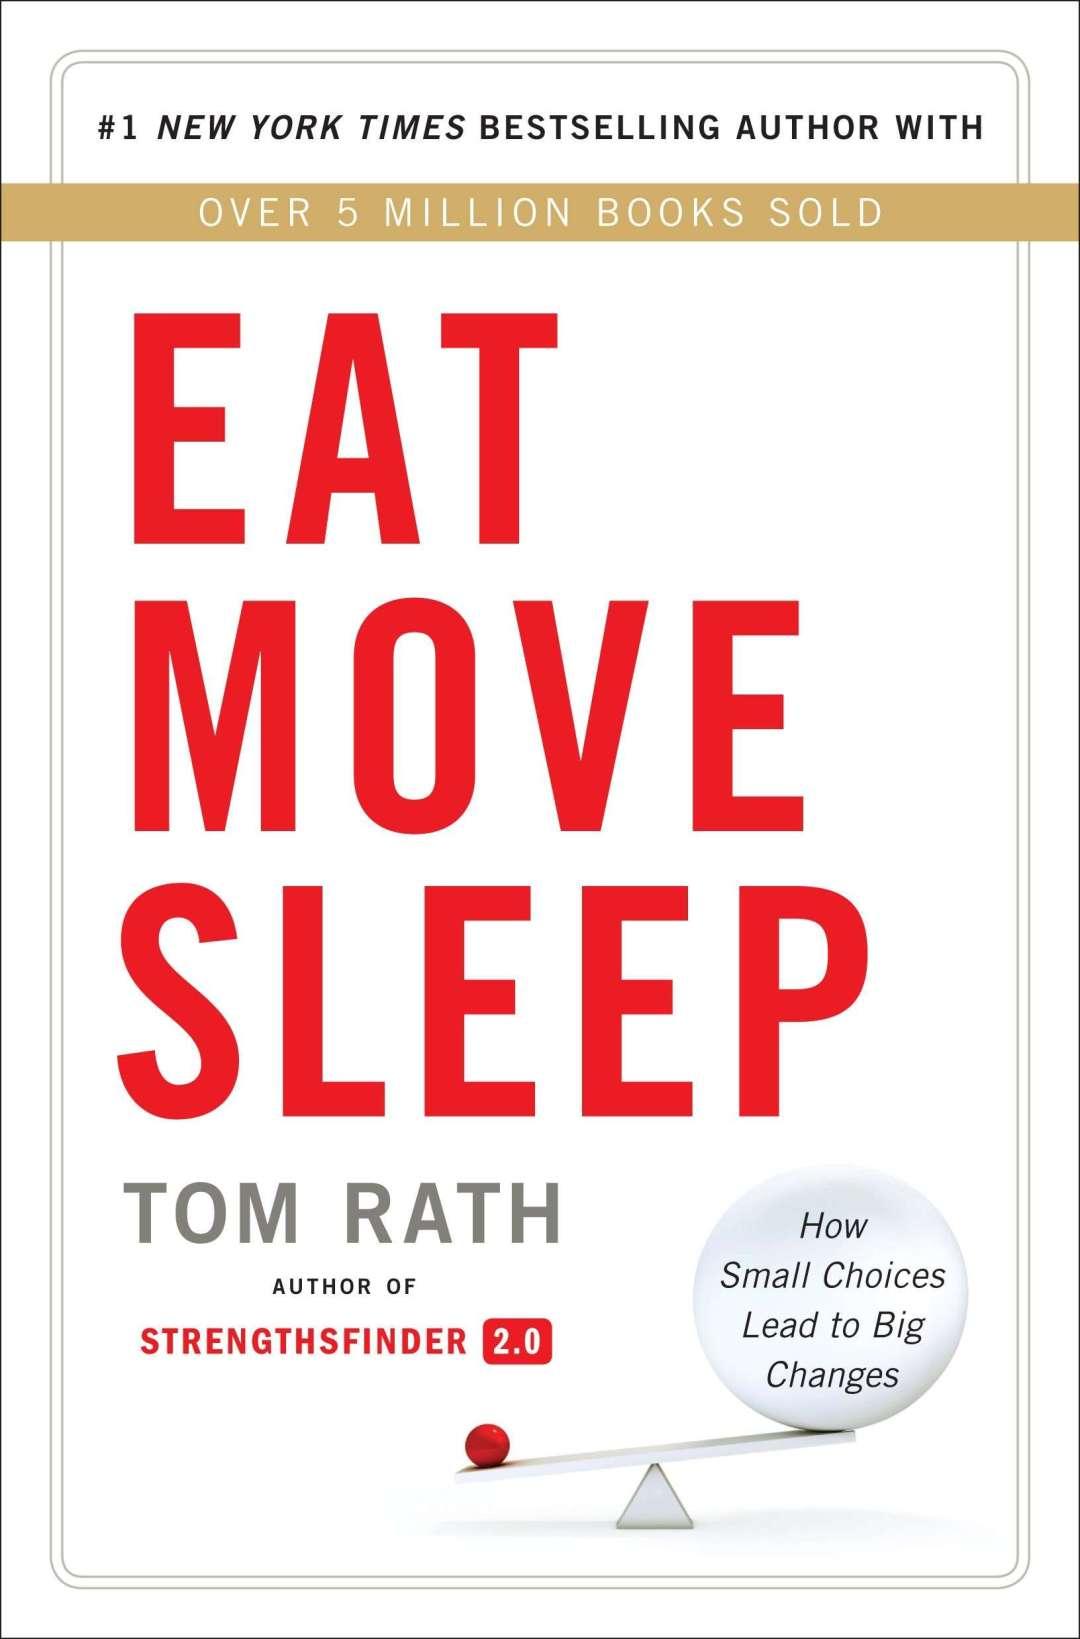 Vidya Sury Eat Move Sleep